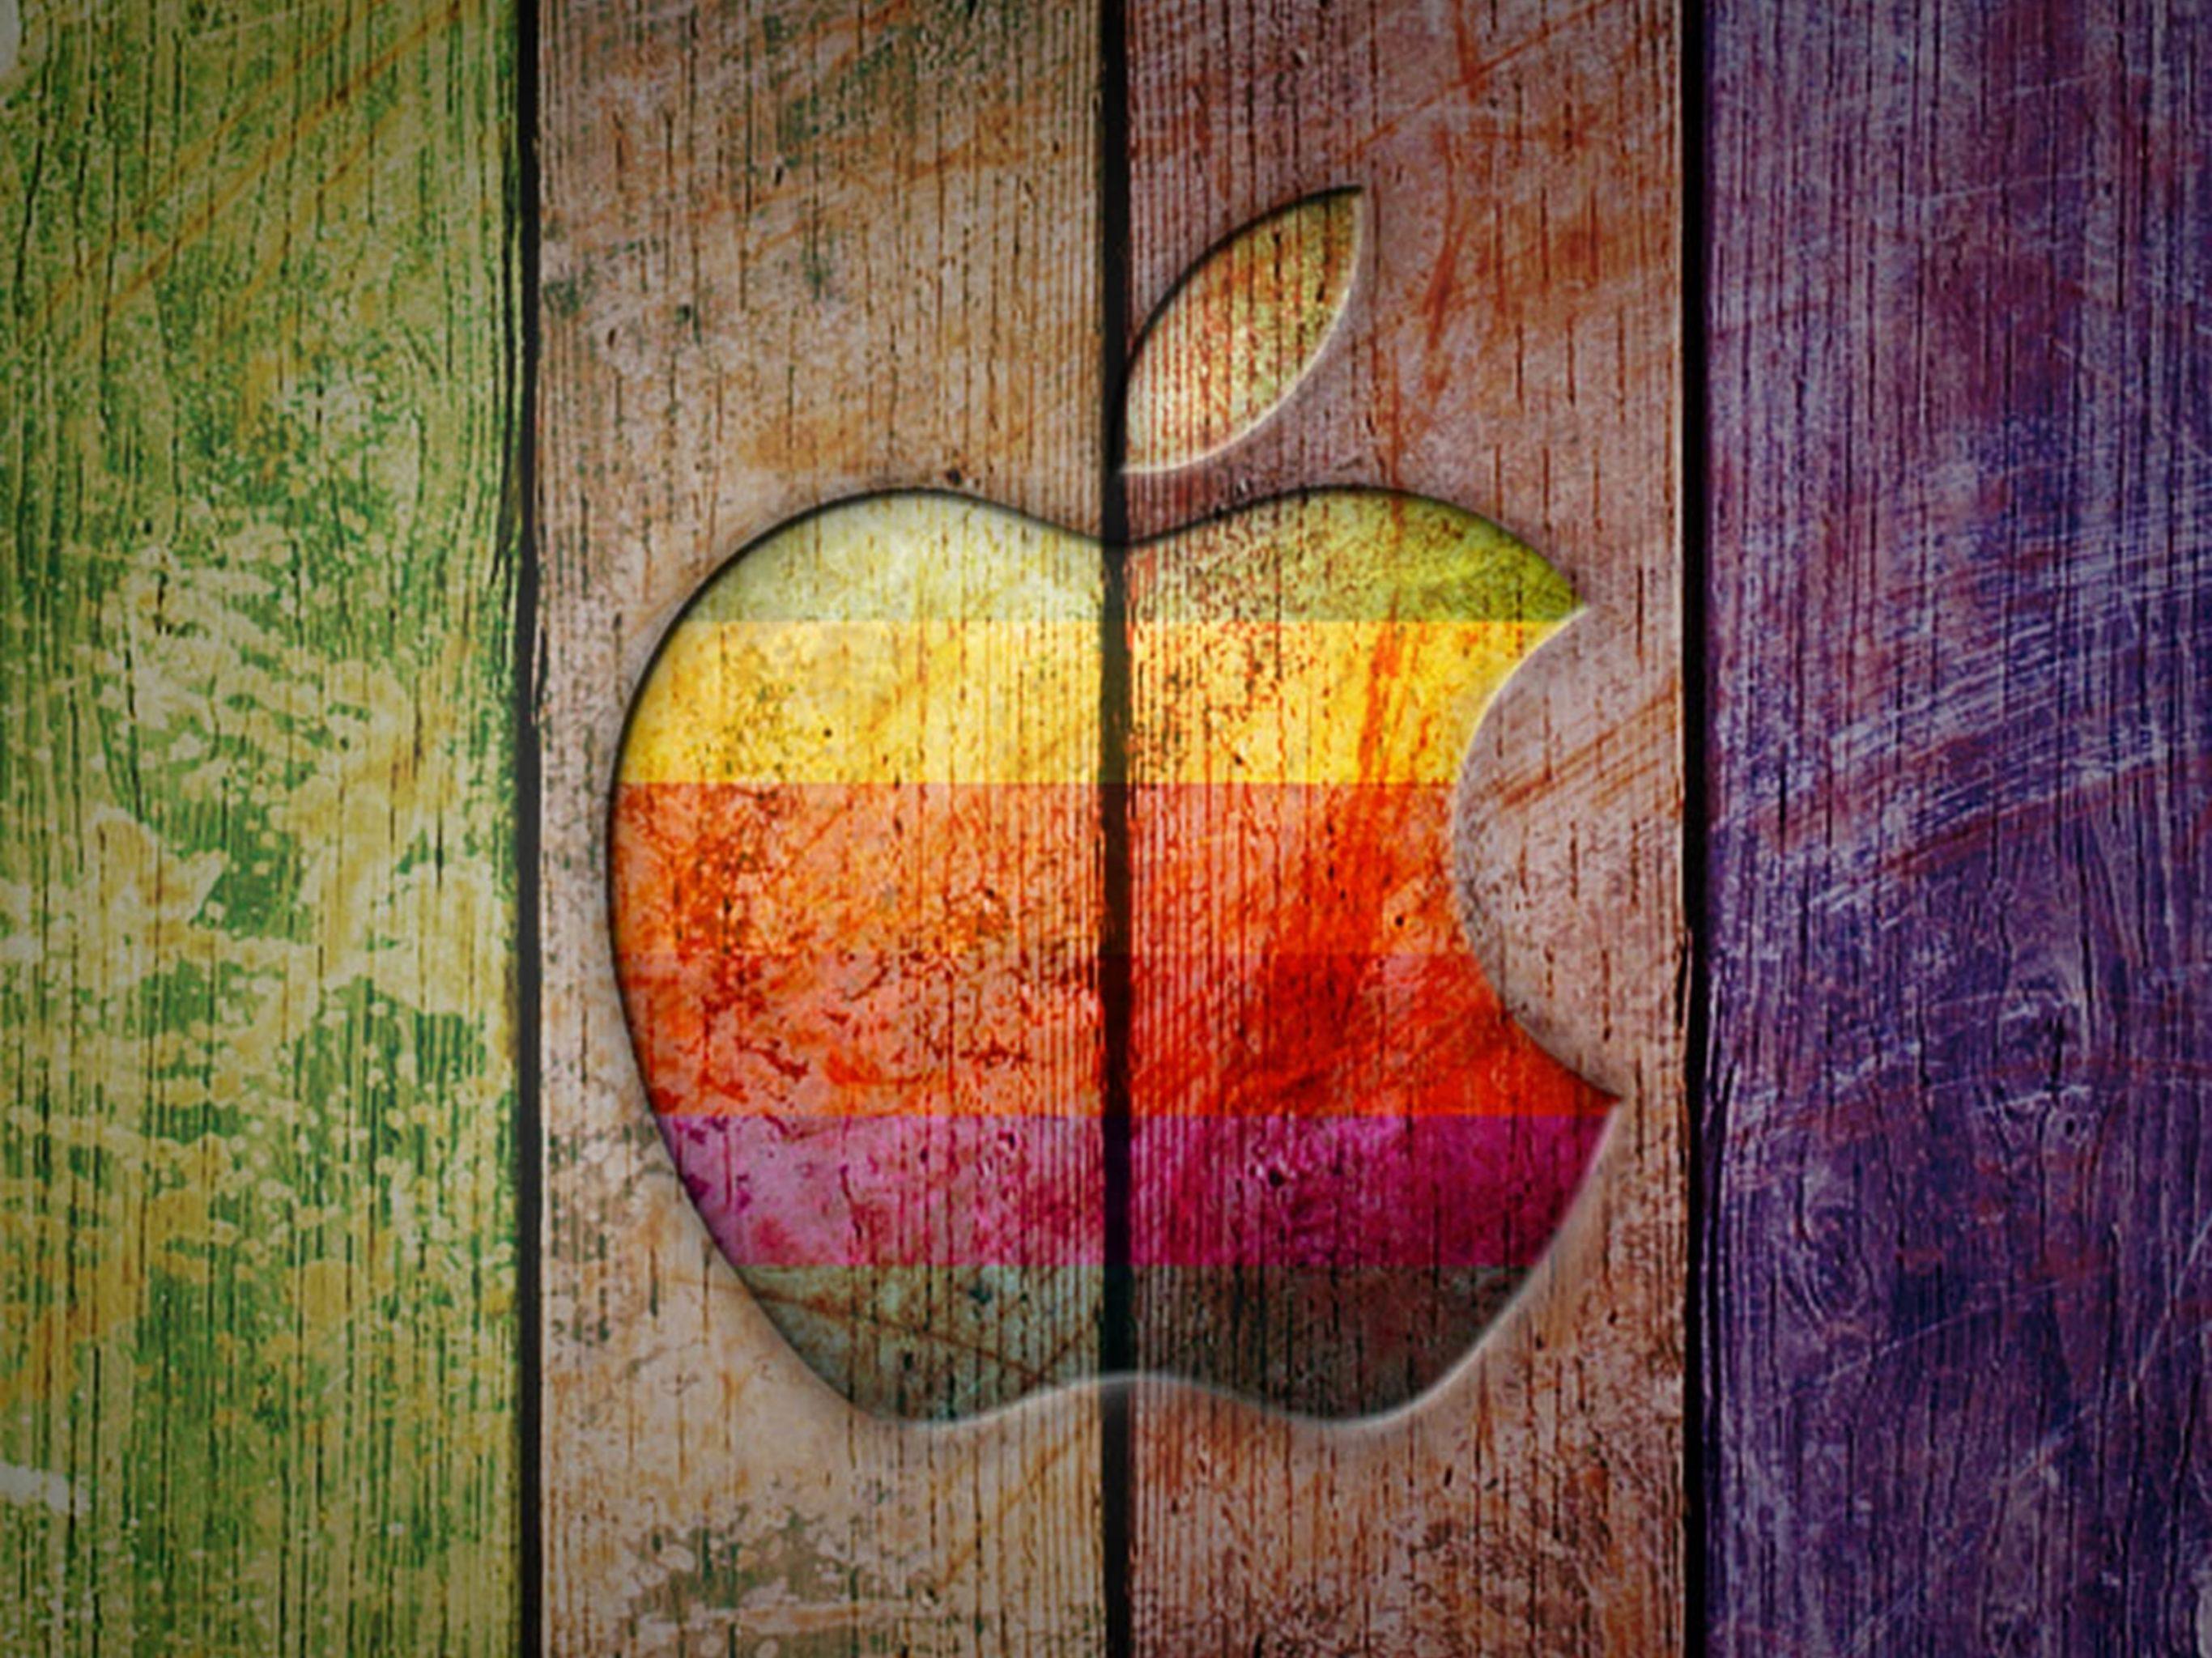 2732x2048 iPad air iPad Pro wallpapers Apple Logo on Colorful Wood Ipad Wallpaper 2732x2048 pixels resolution